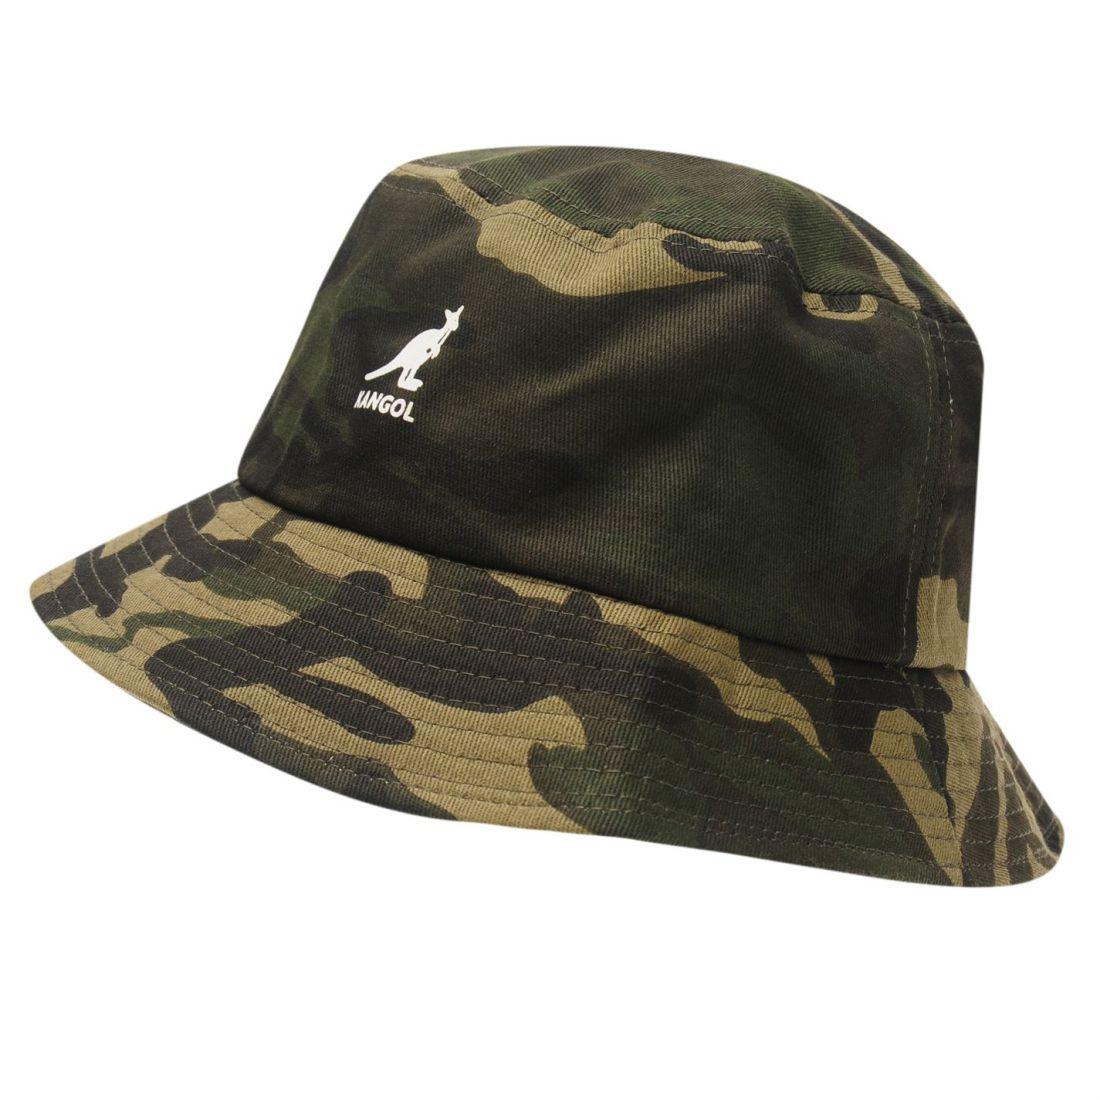 Details about Kangol Mens Camouflage Bucket Hat Cotton Pattern 6fbb663e9d9